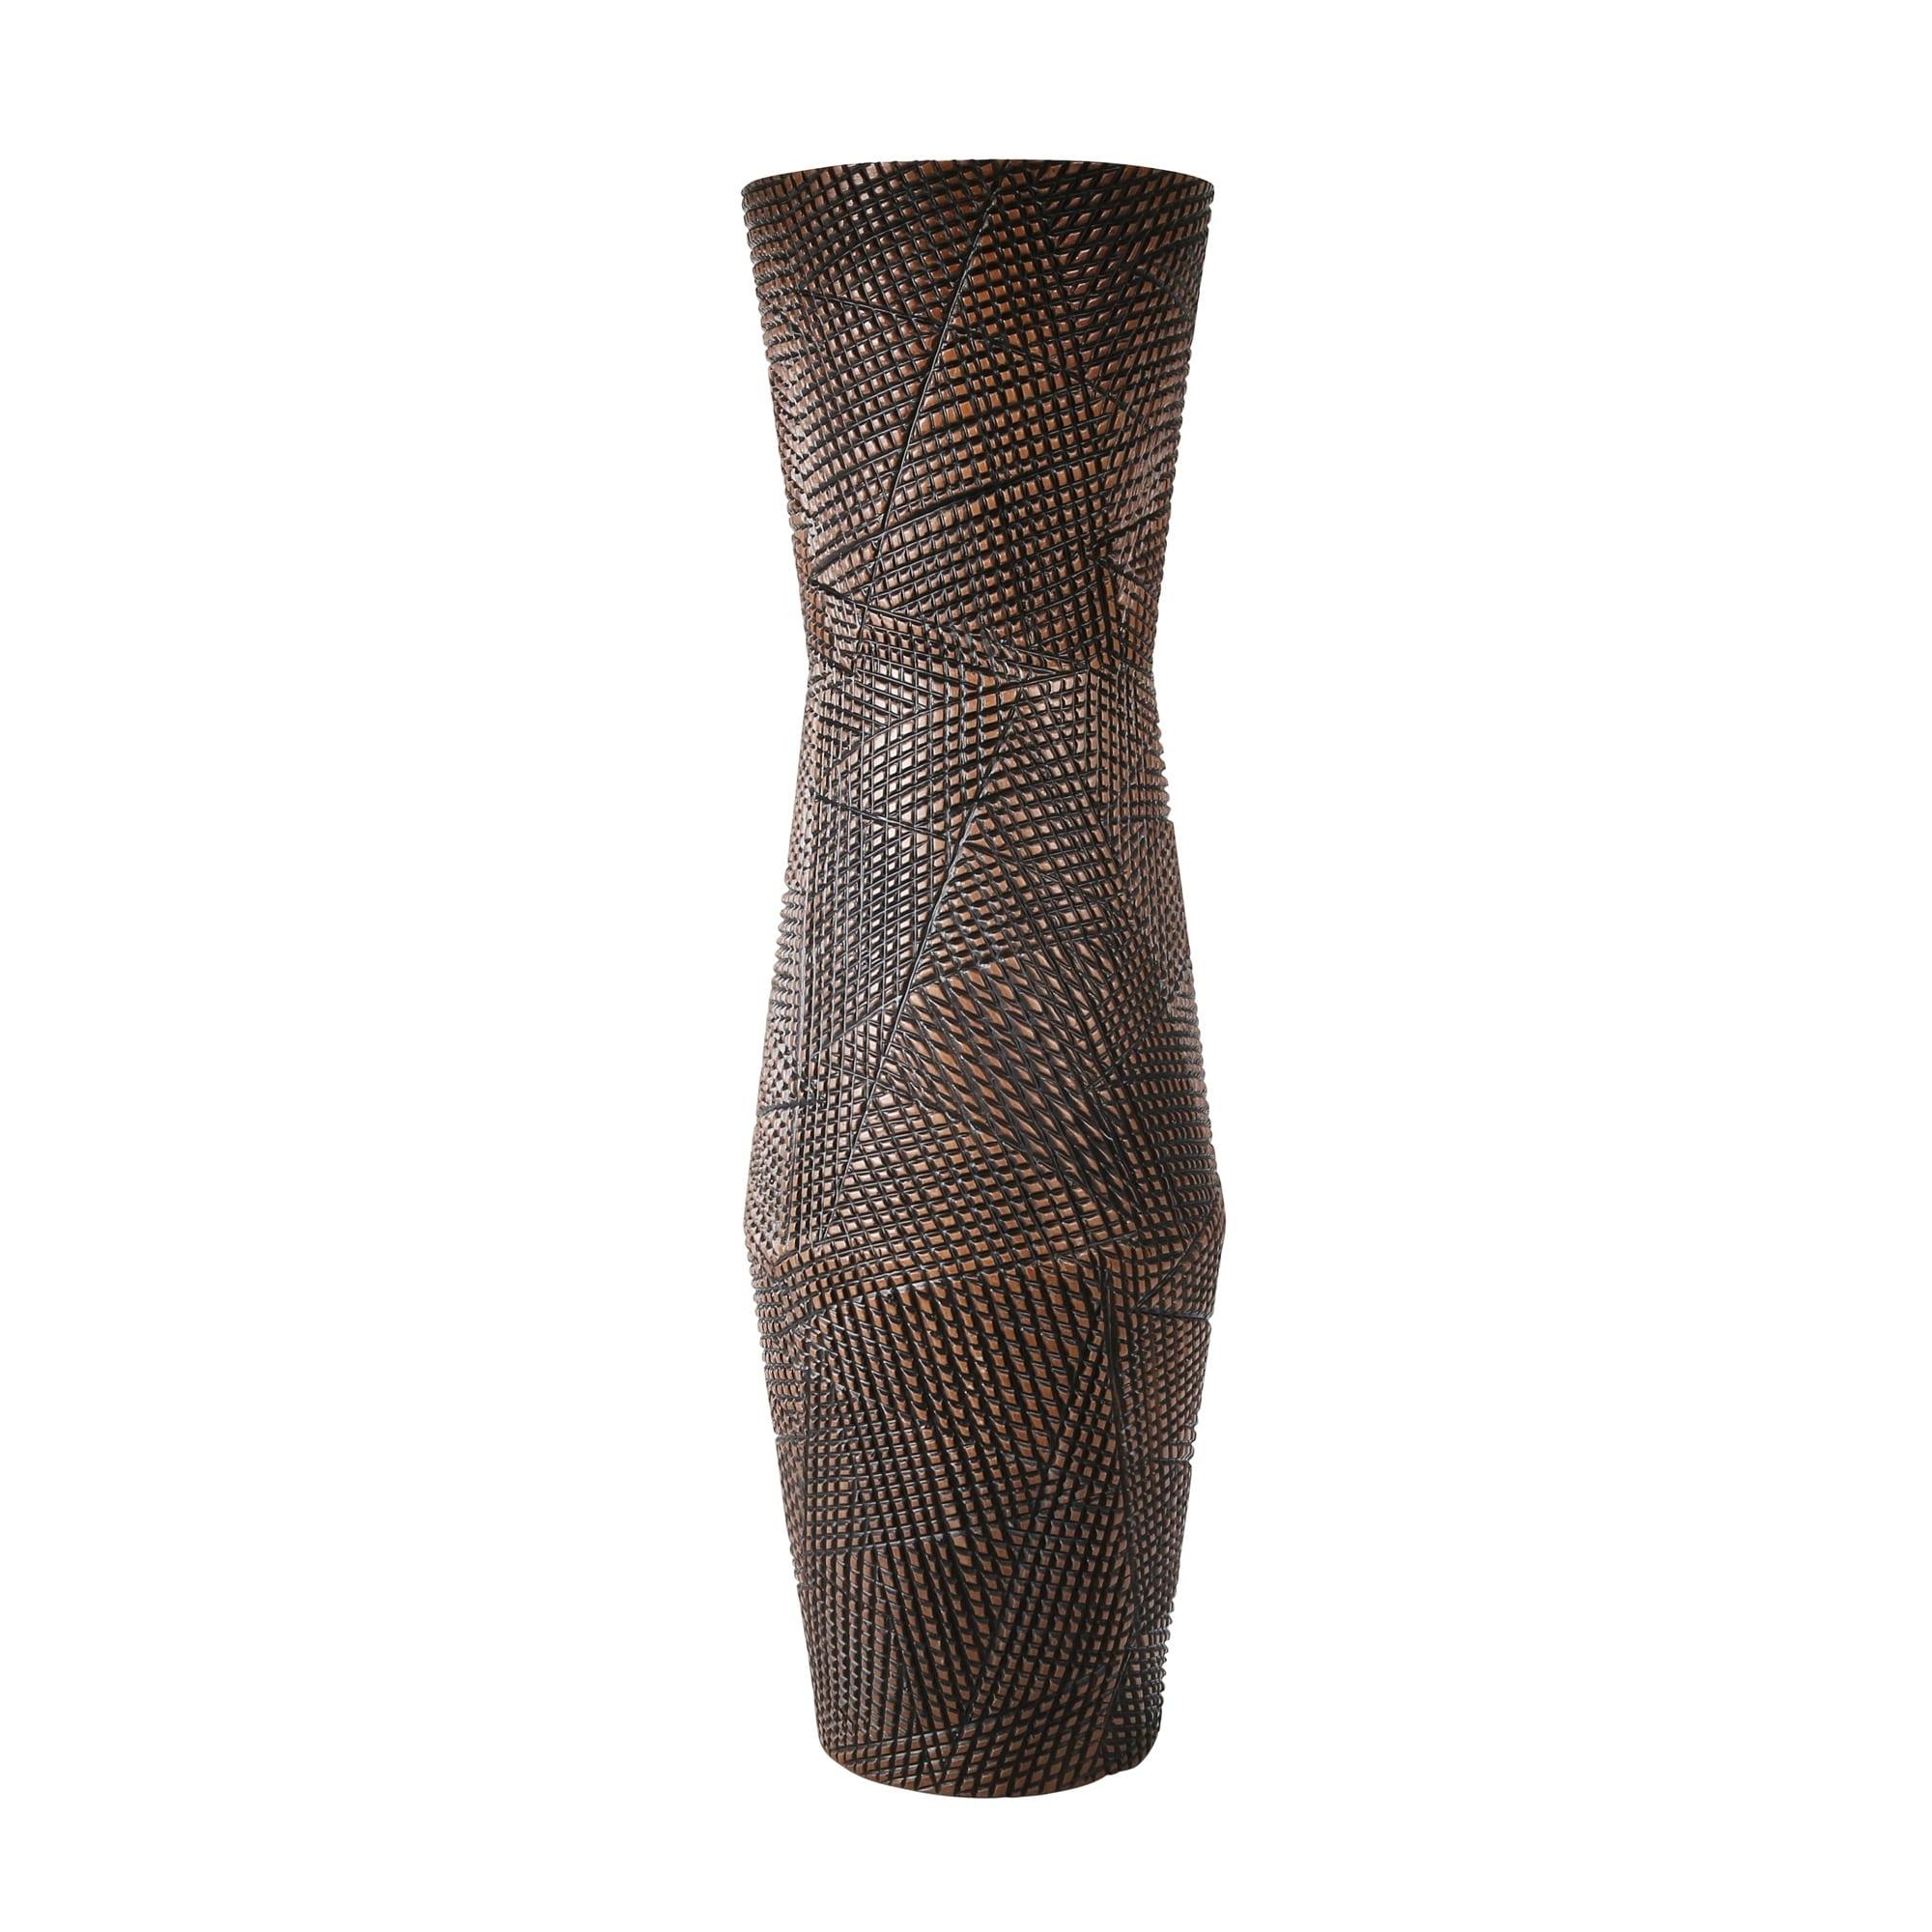 Sagebrook Home Decorative Ceramic Vase, Brown (8.25x 8.25 x23.25,SILVER)